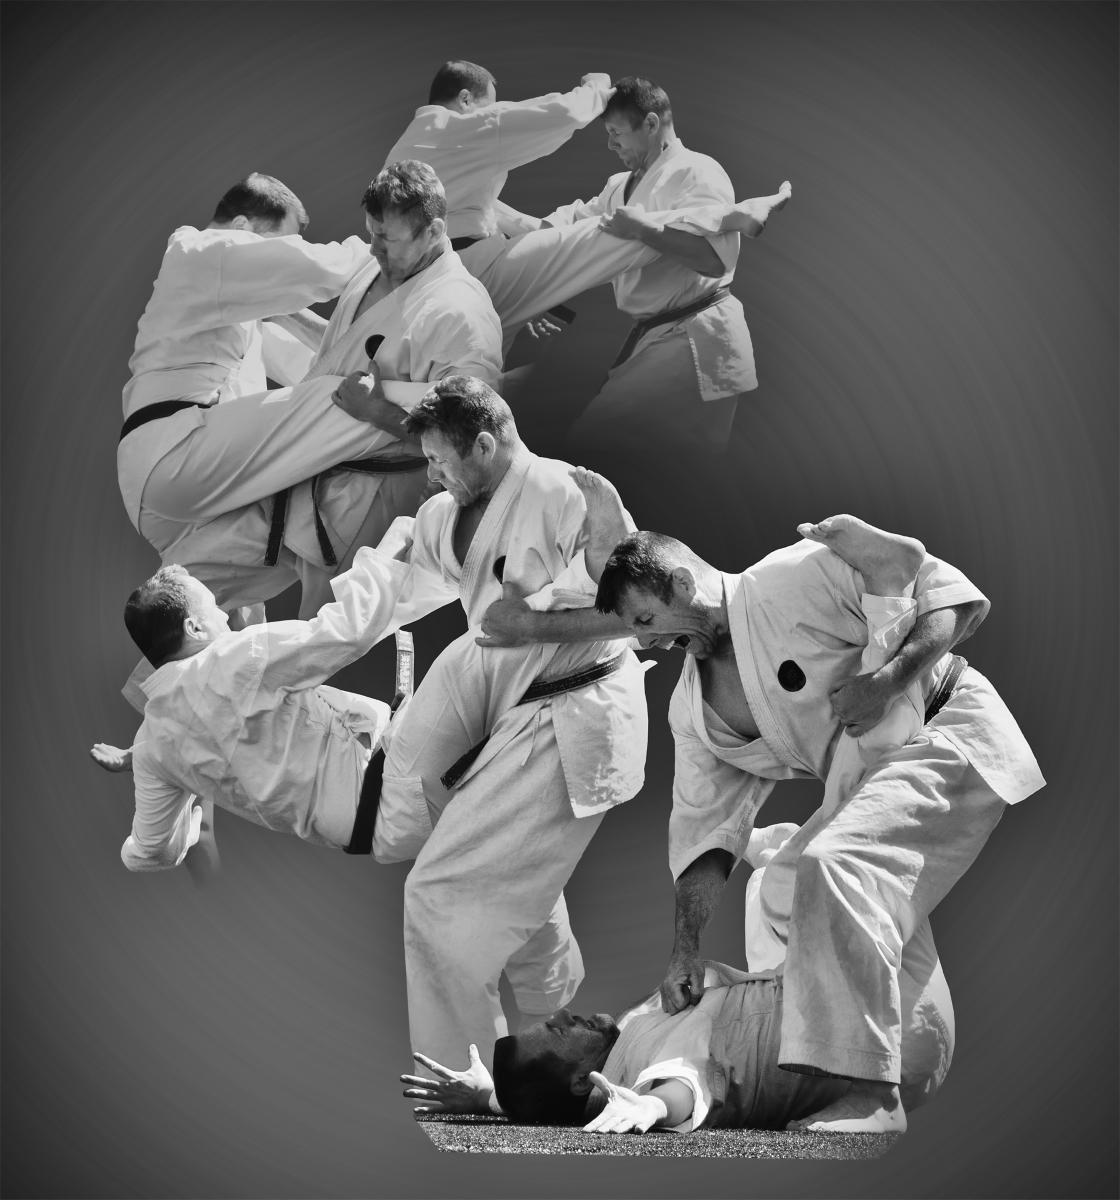 'A Karate Throw and Takedown' (CI 1 Place) by Jean Millman - AL